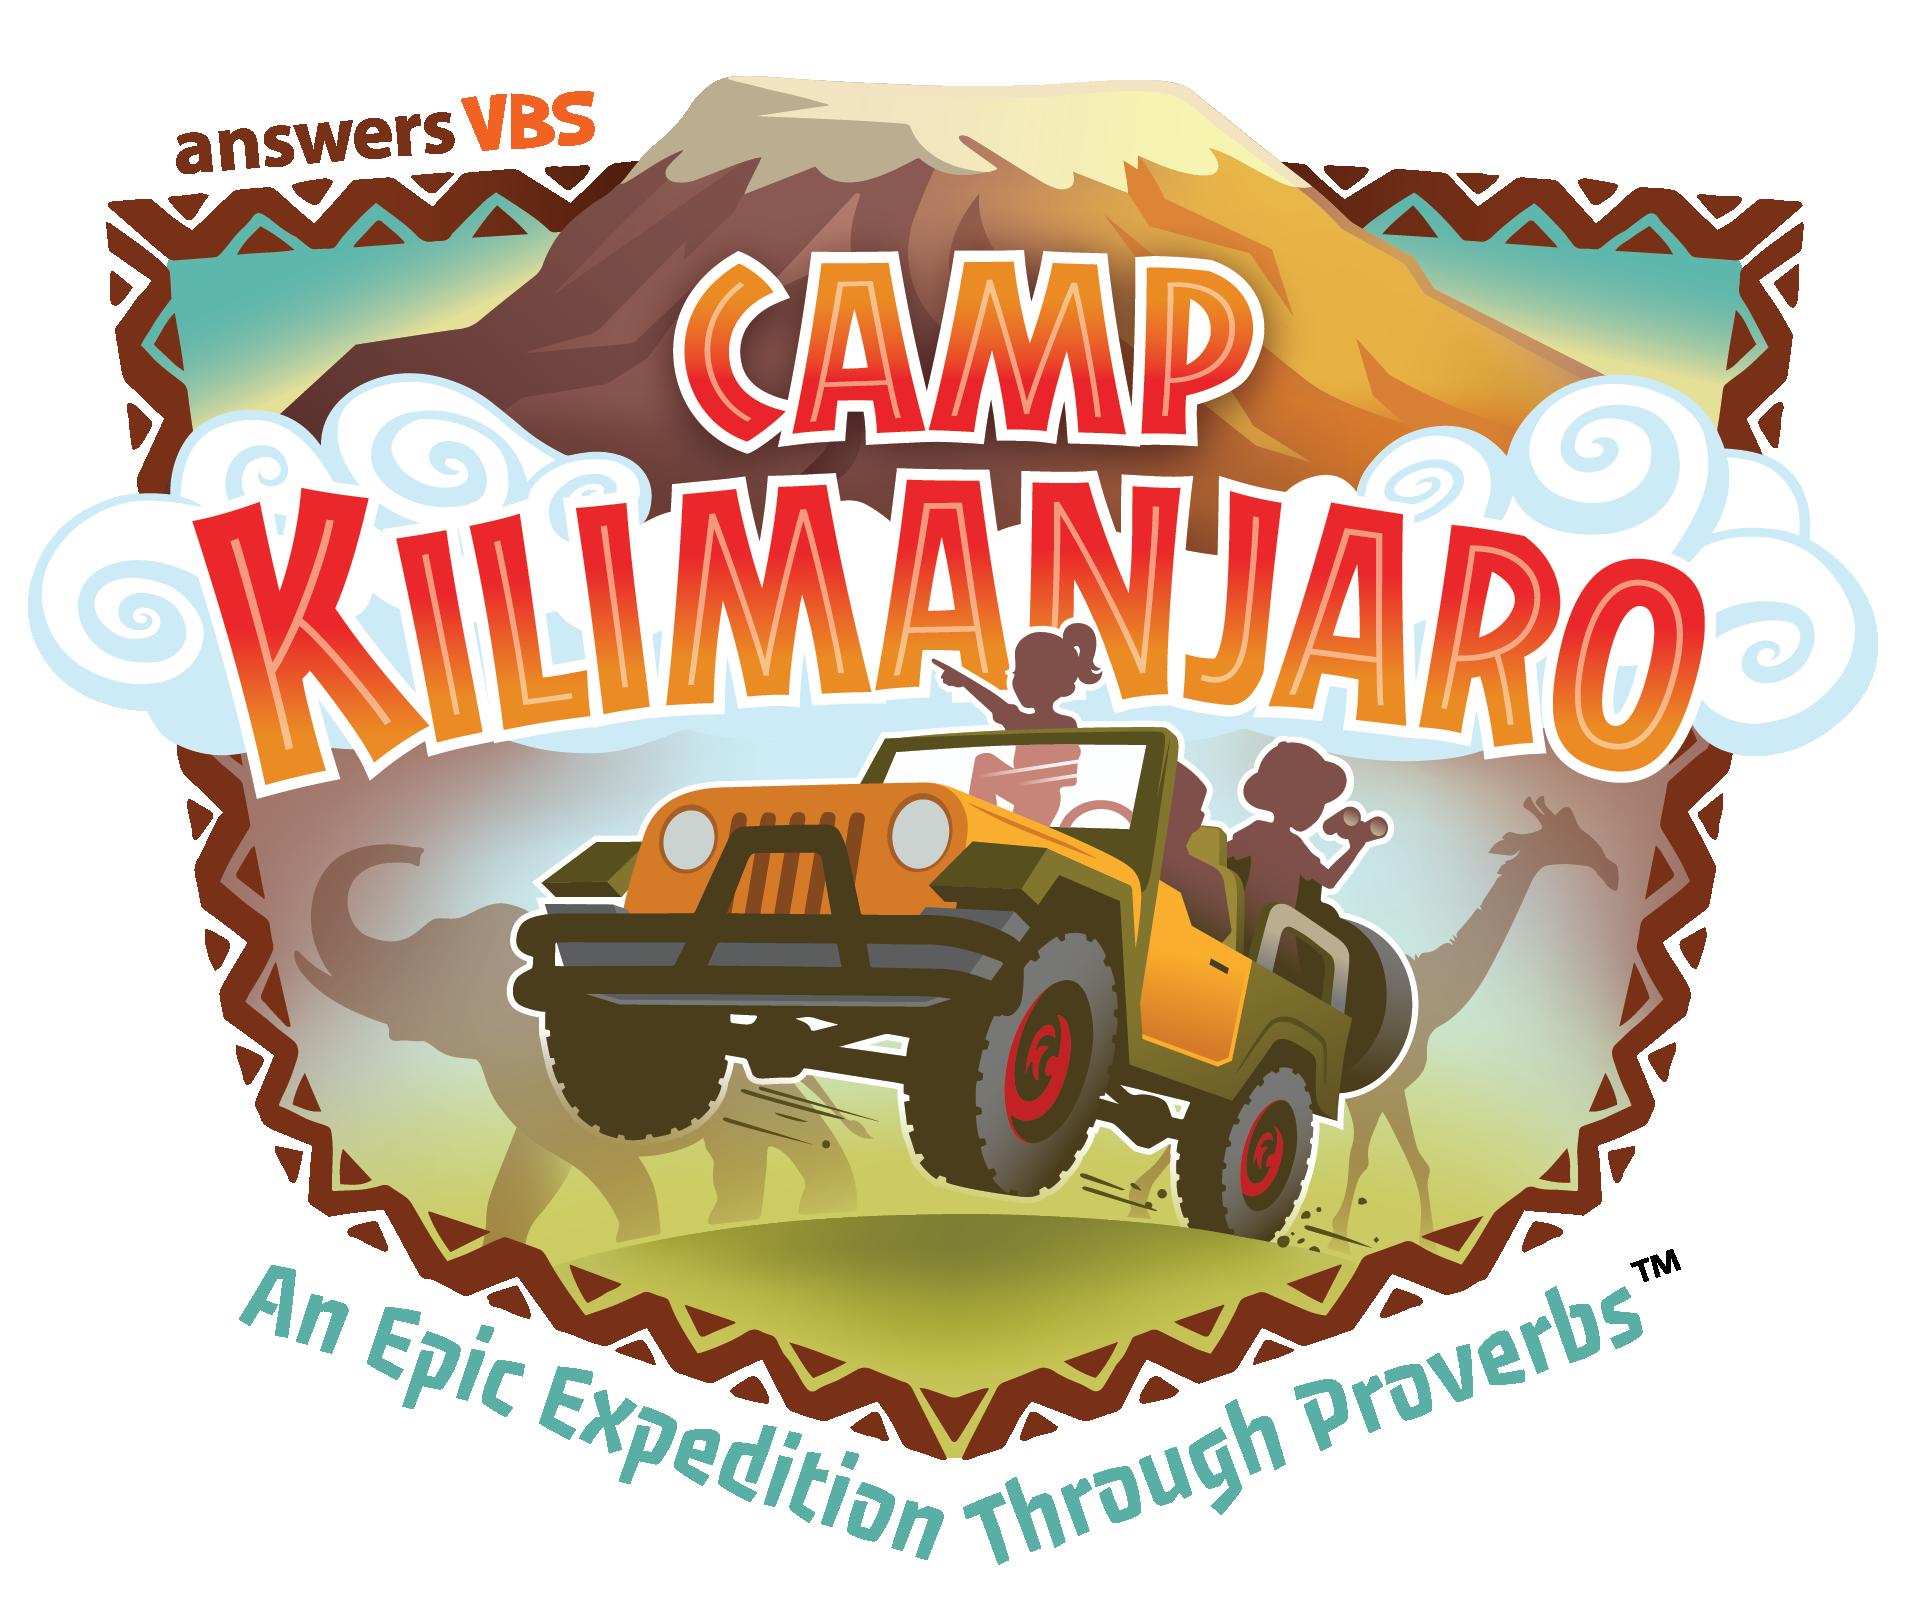 Mount Kilimanjaro clipart #8, Download drawings